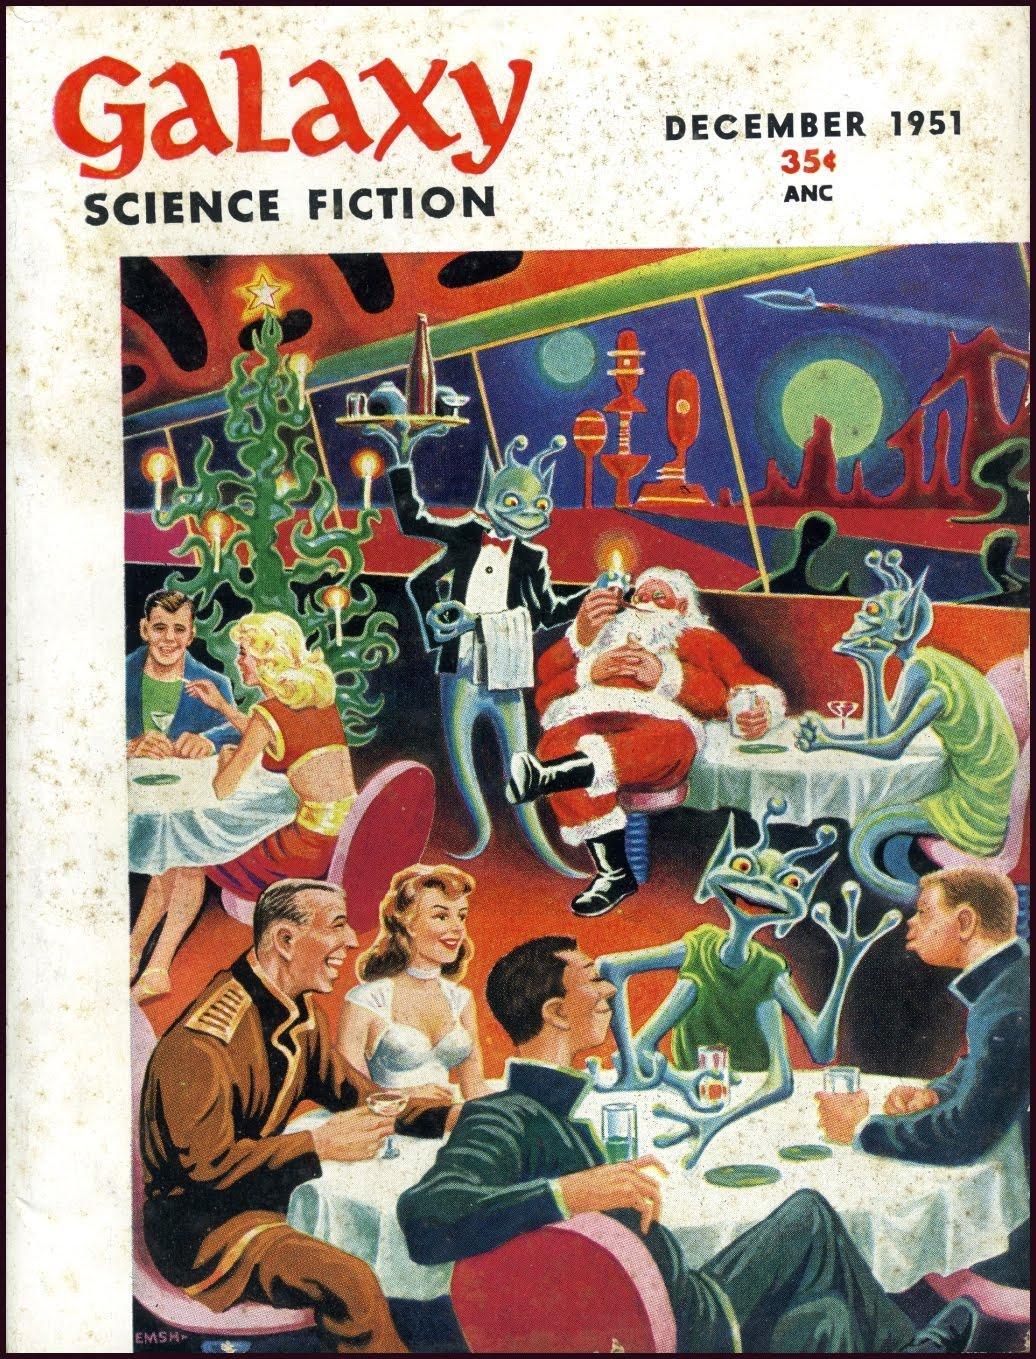 Figure 6: Galaxy Magazine December 1951